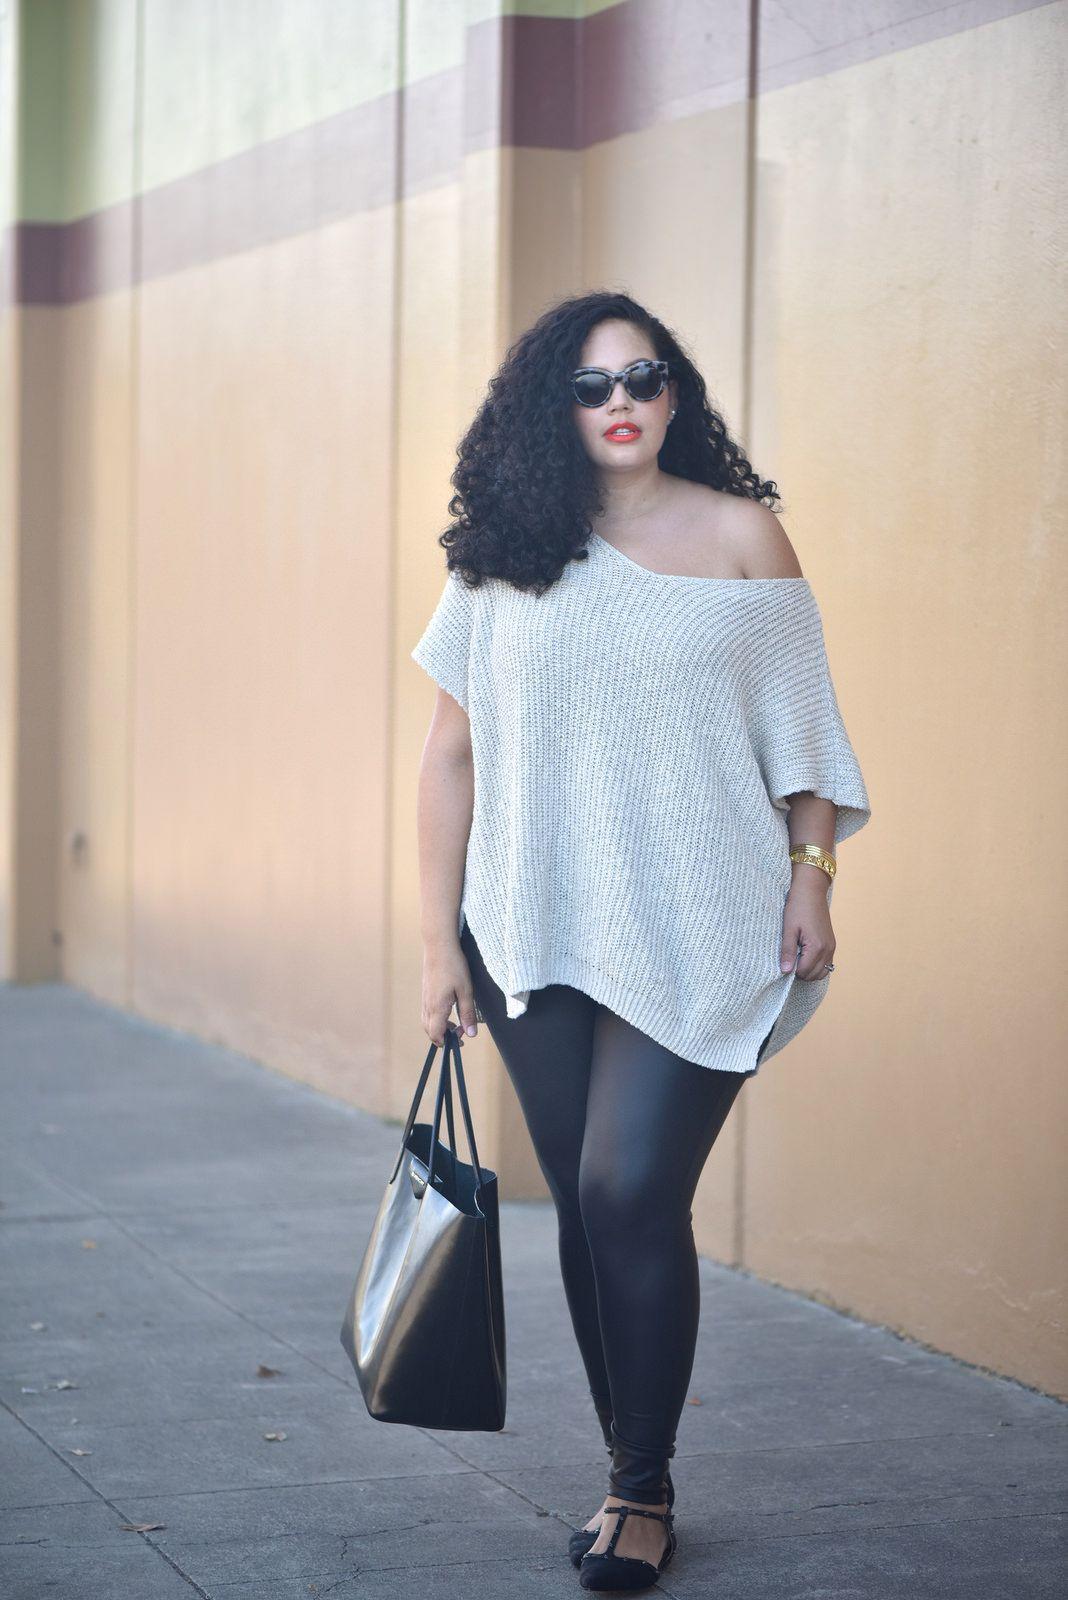 bd83f1e22fd00 Plus Size Fashion - Plus Size Outfit - Oversize Sweater